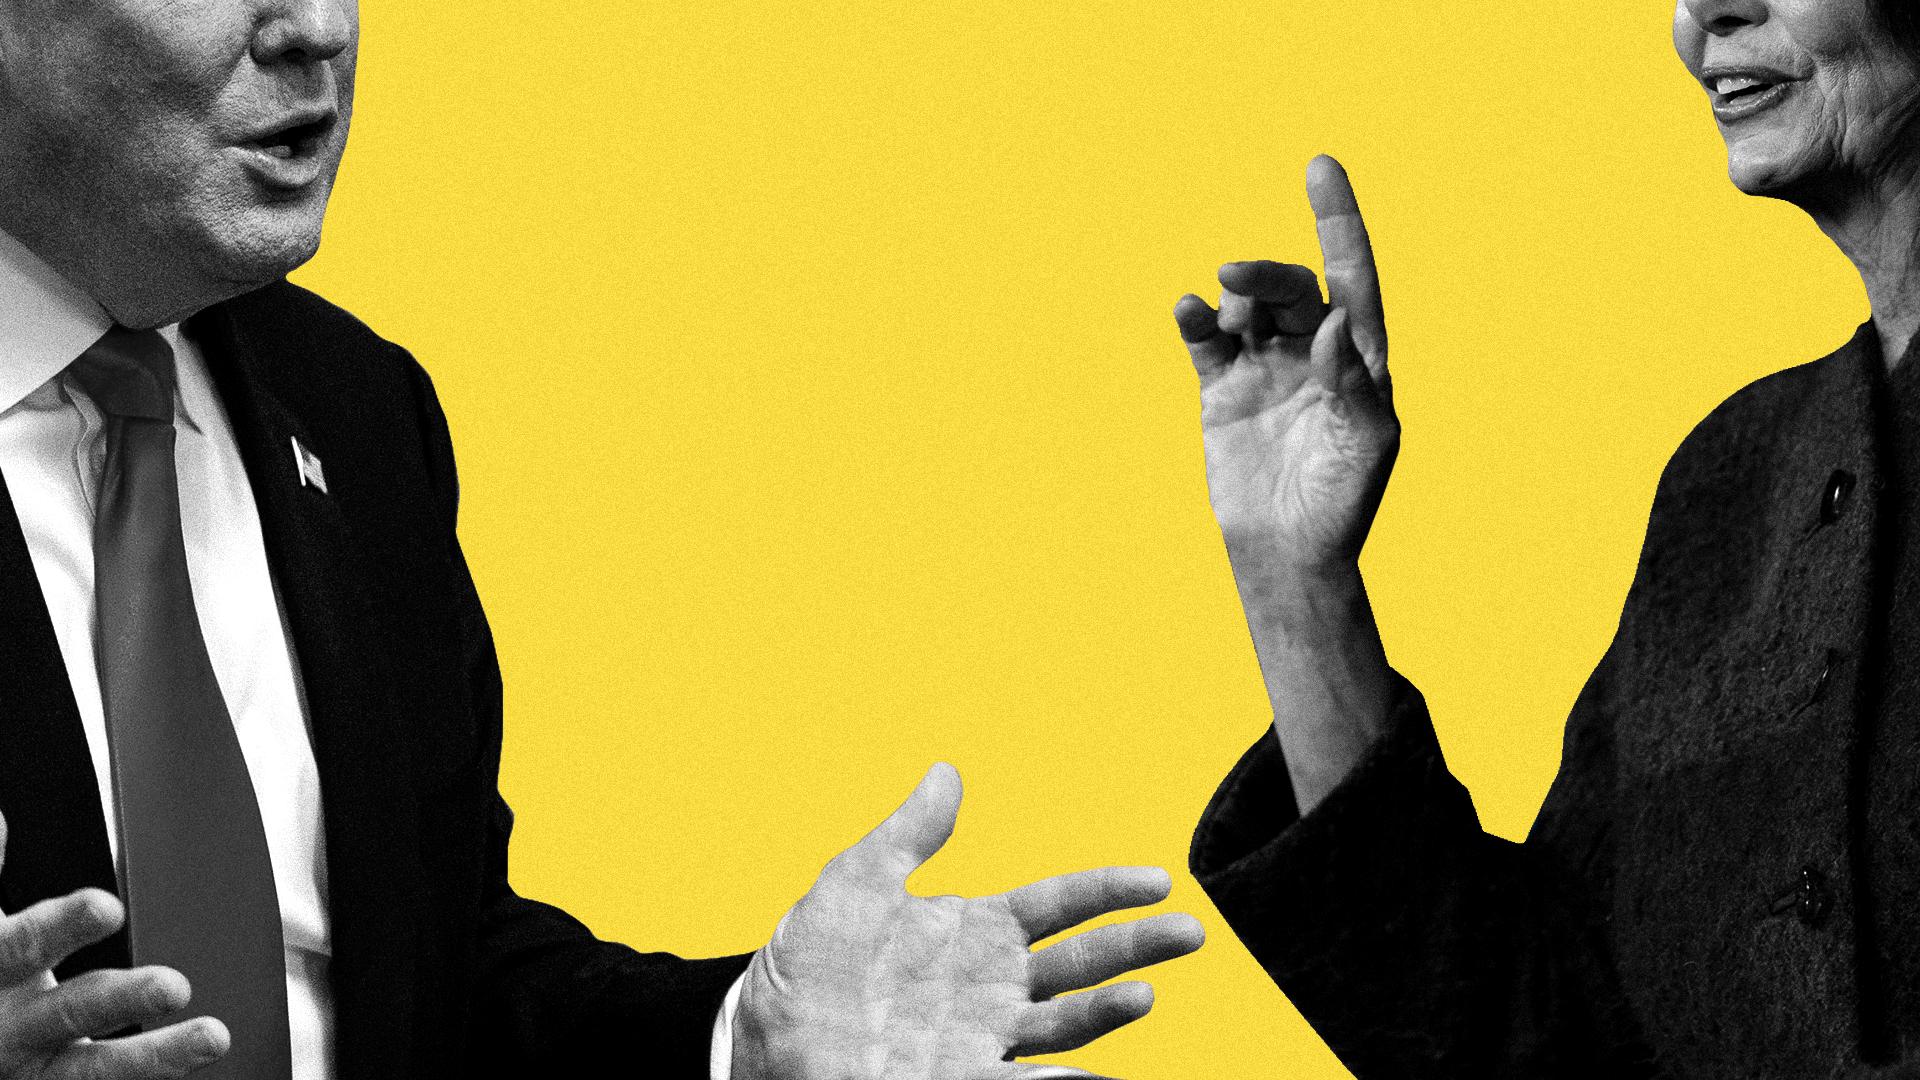 Illustration of President Trump and House Speaker Pelosi.